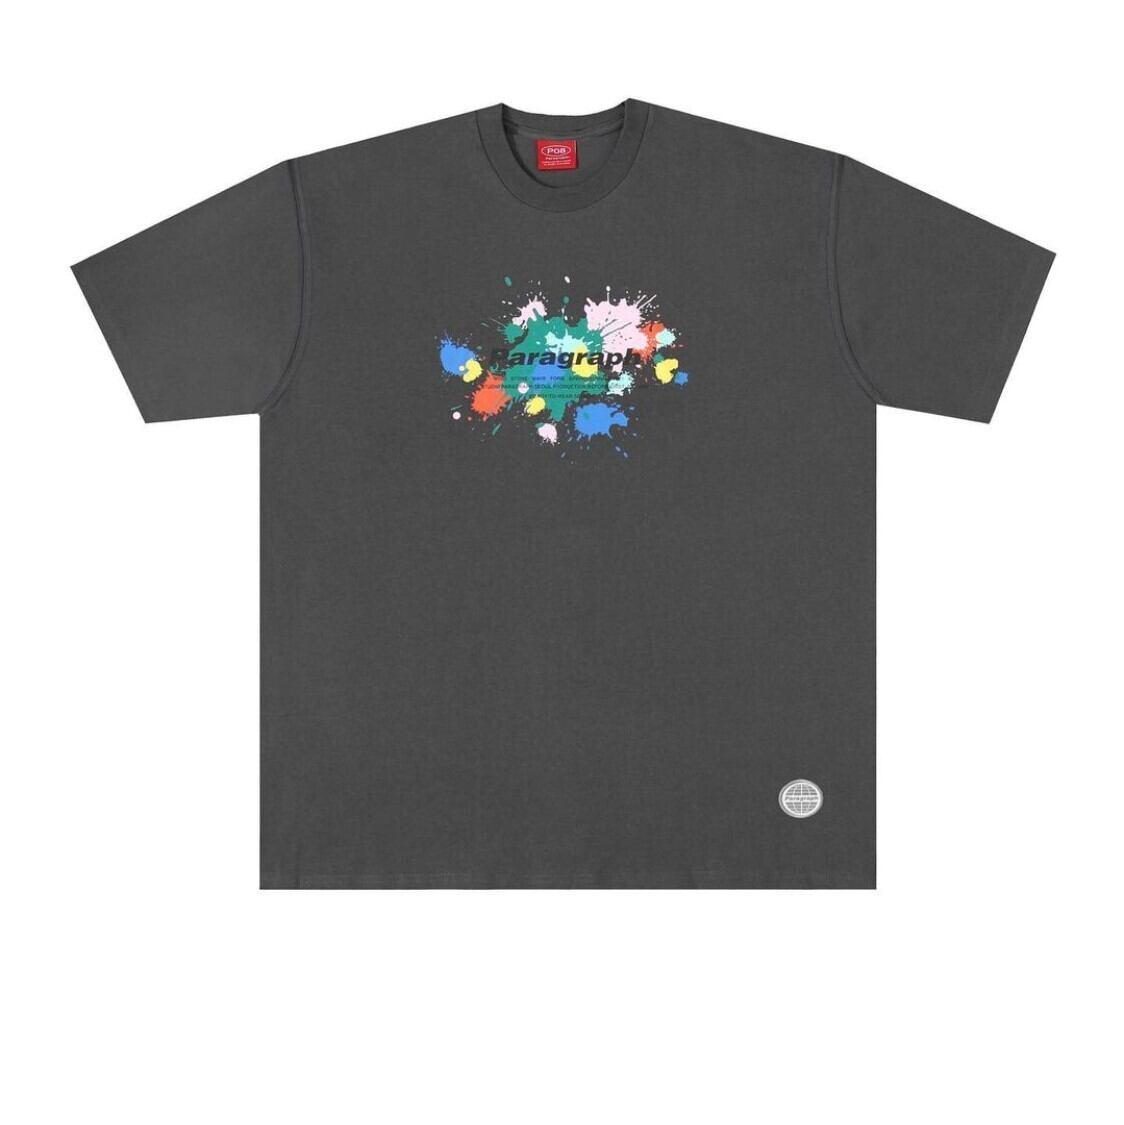 【PARAGRAPH】スプラッシュプリントTシャツ